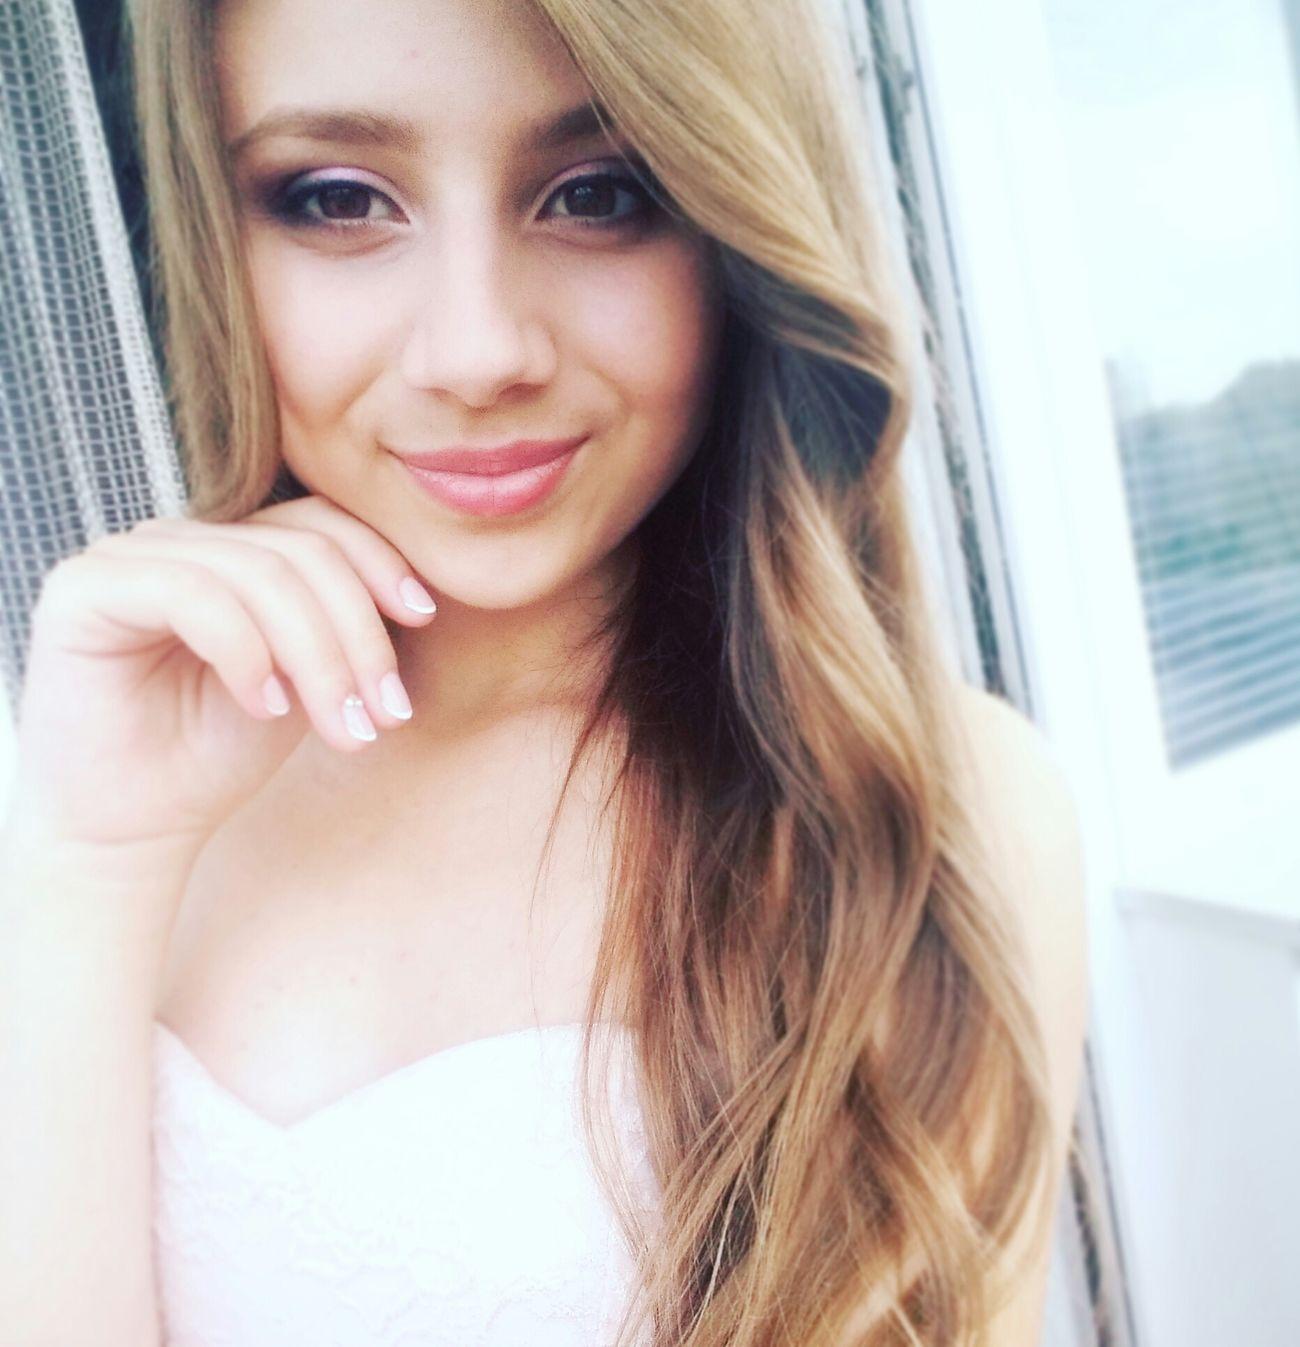 Hi! 😻😻😻❤️ 😉😉summer ☀ Ivano-frankivsk Summer Ukraine 😍😌😊 😍😙😙😙😍😍😙😻😻😻